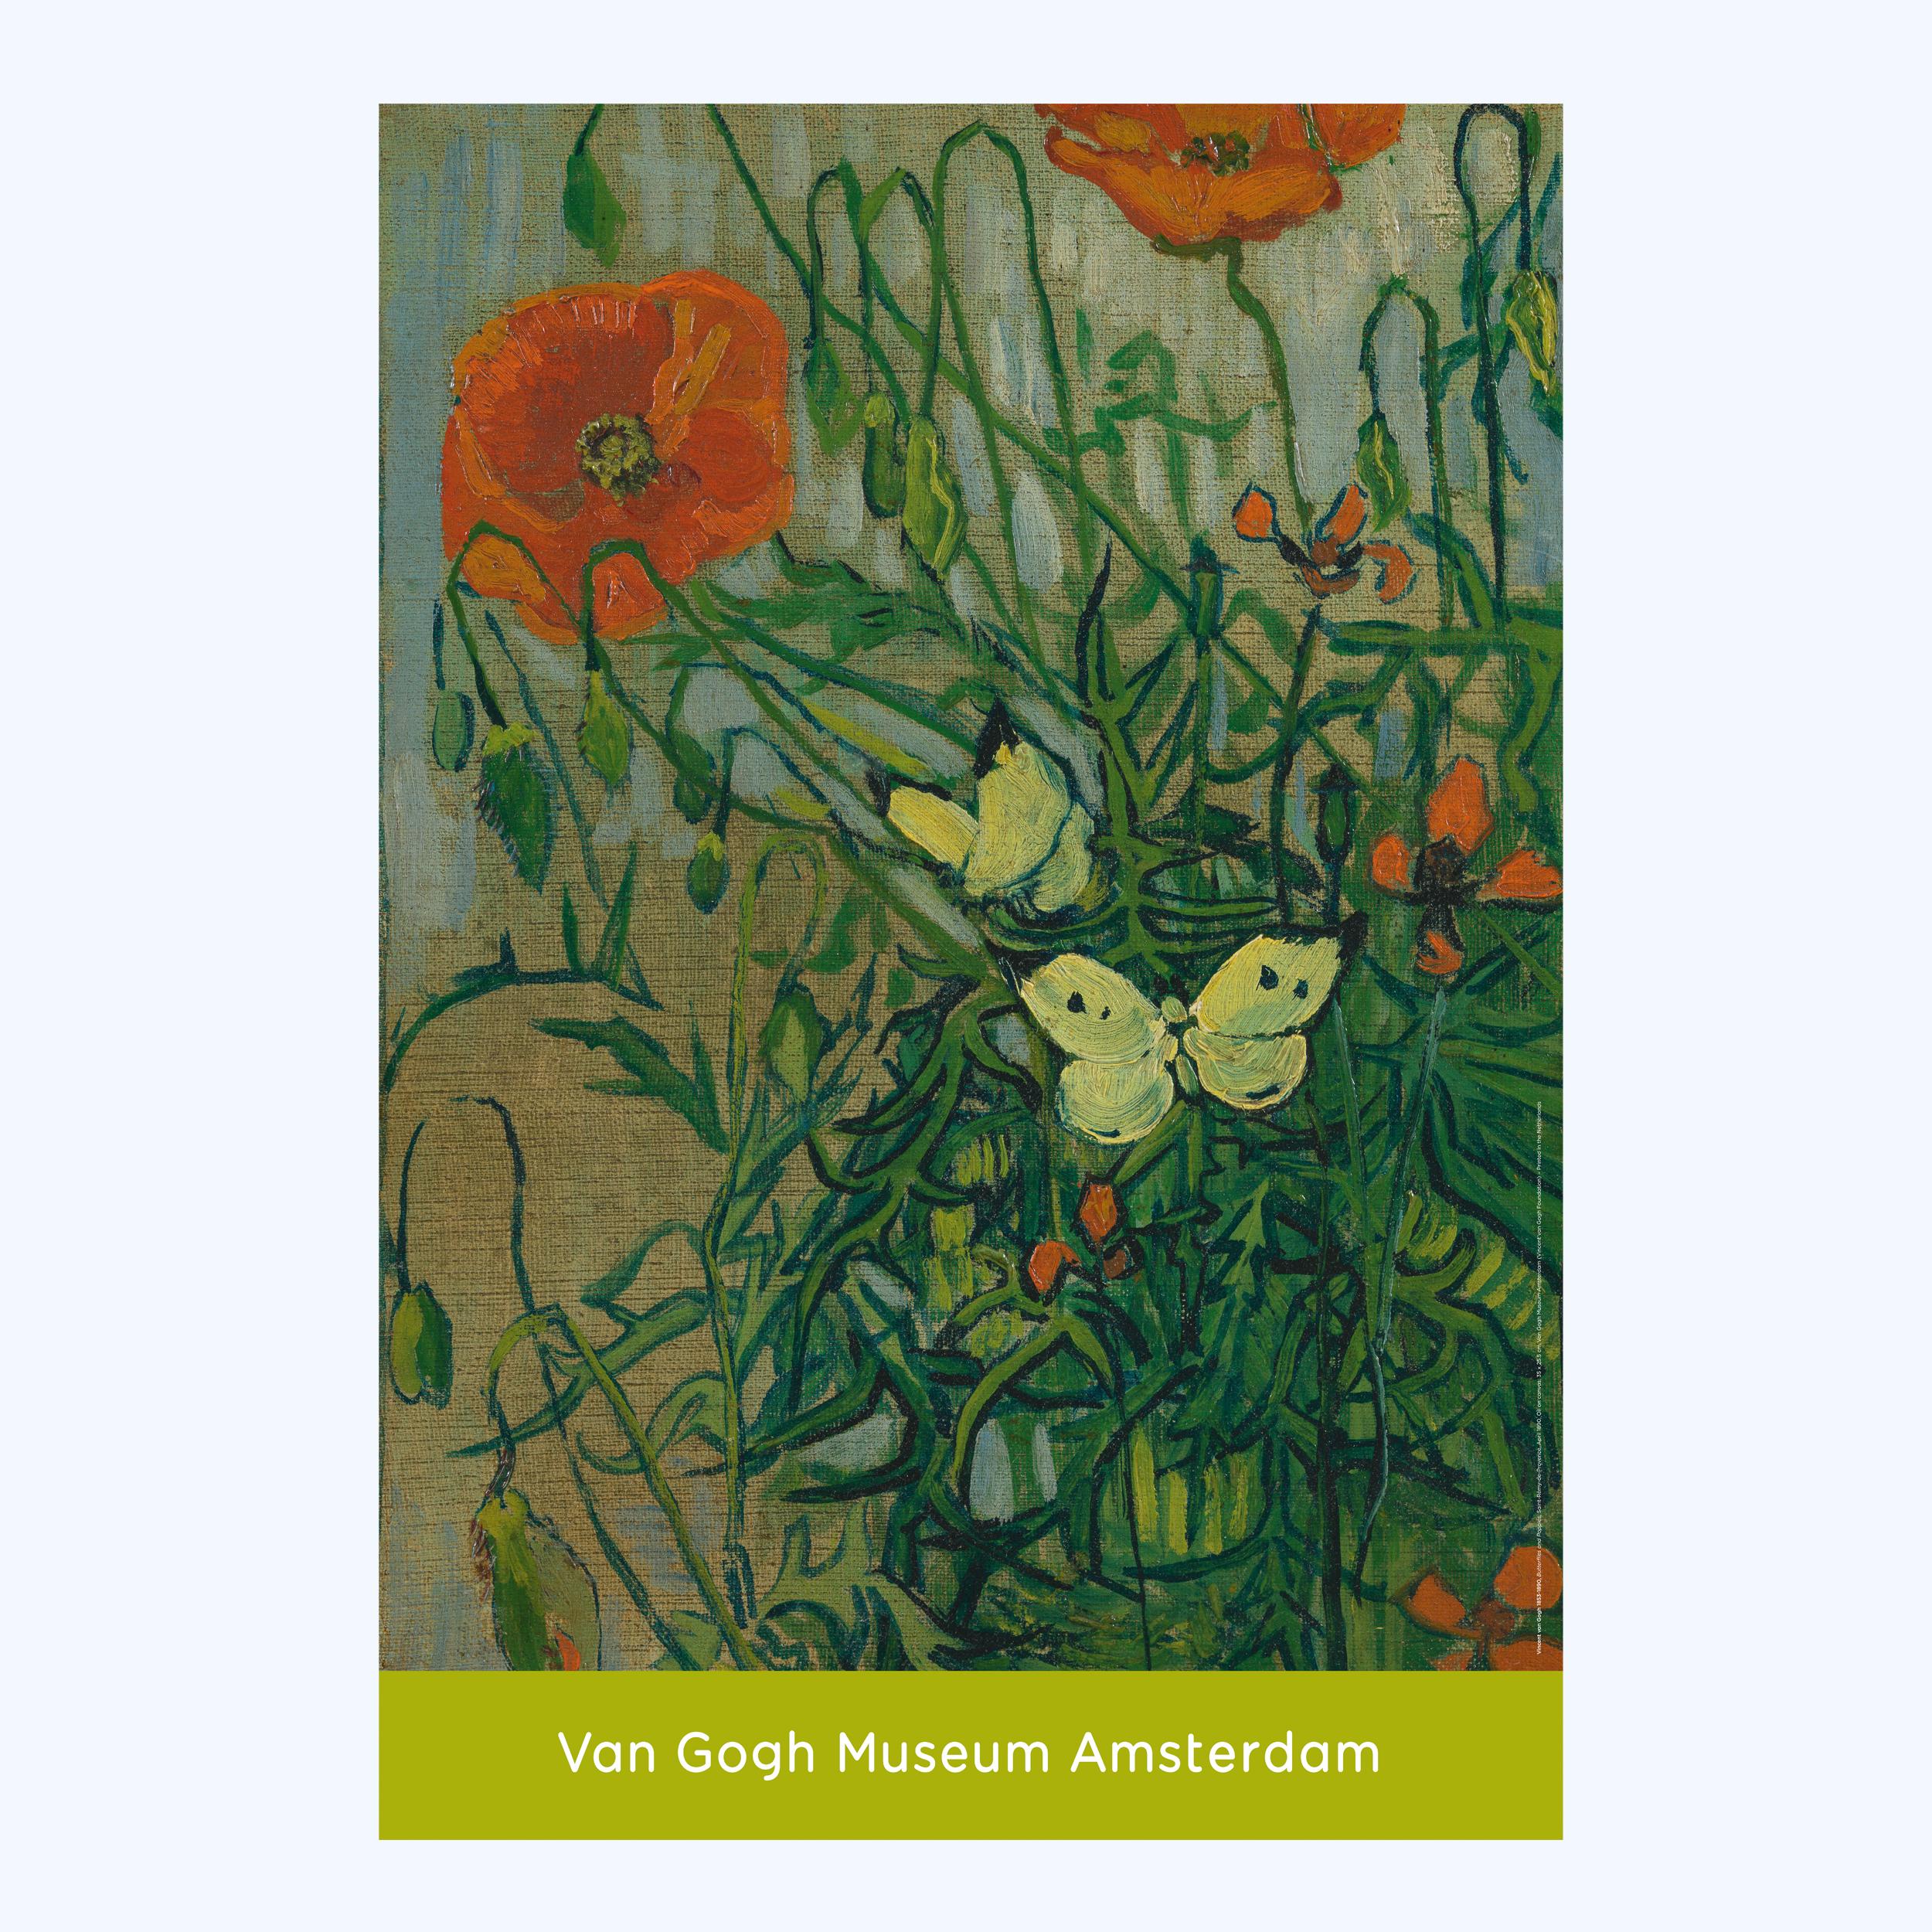 Van Gogh Poster Butterflies and Poppies - Van Gogh Museum shop